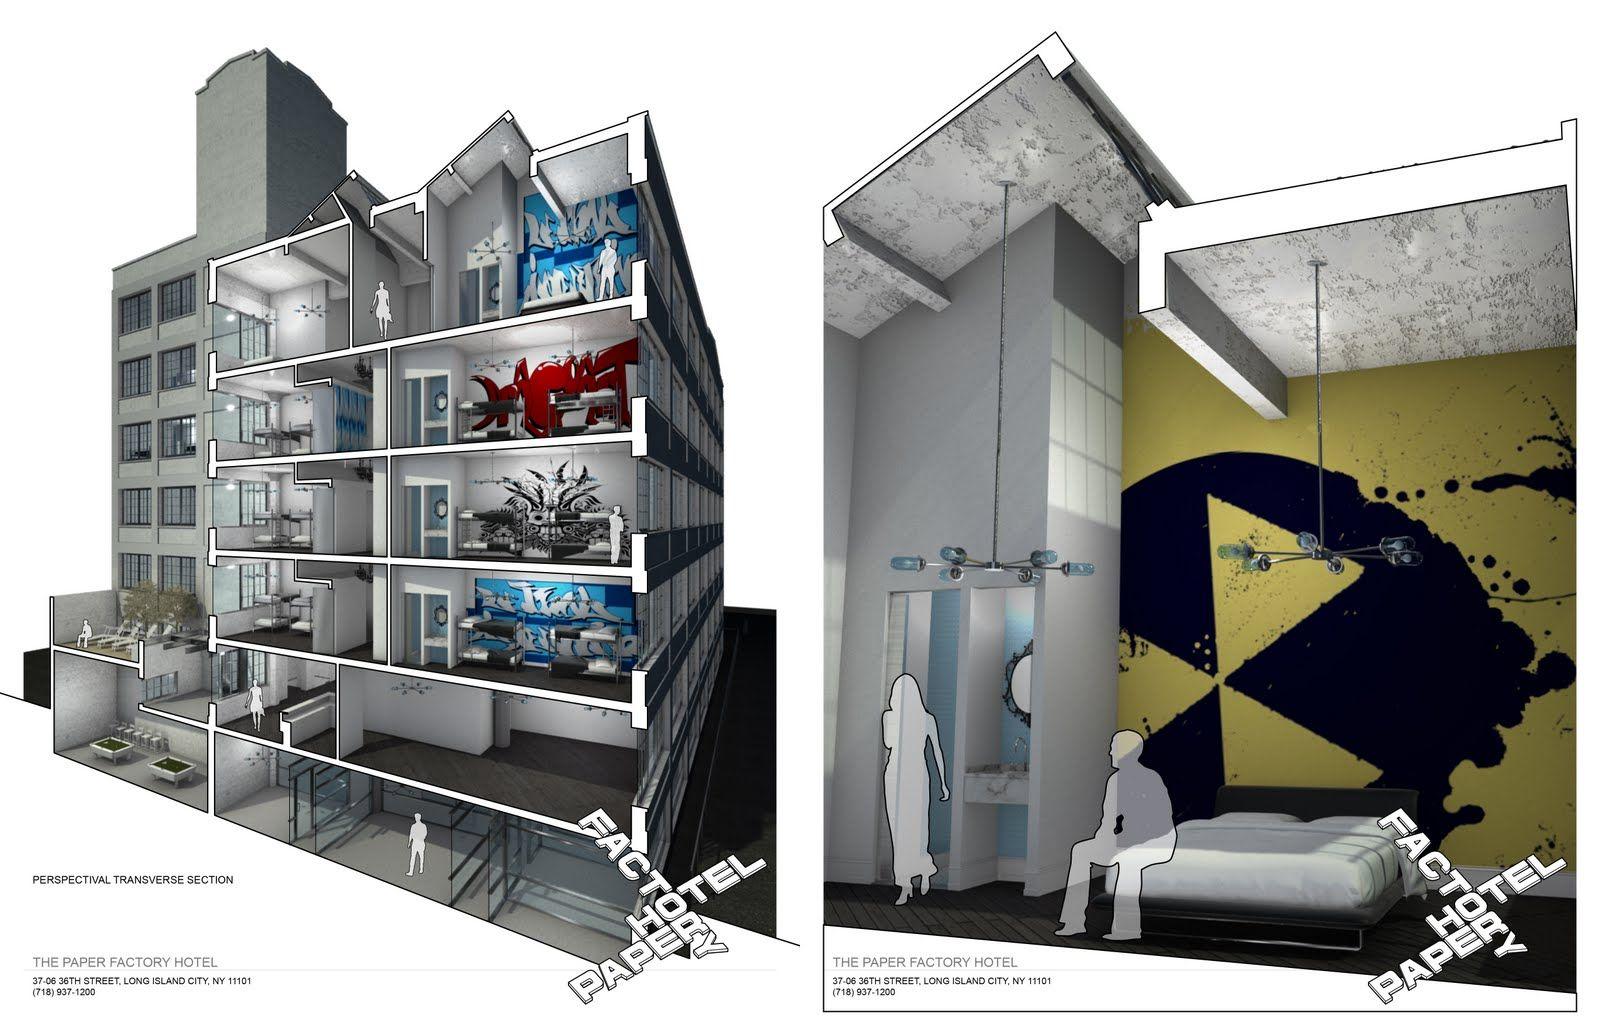 Architectural Technology And Design Development Work Design